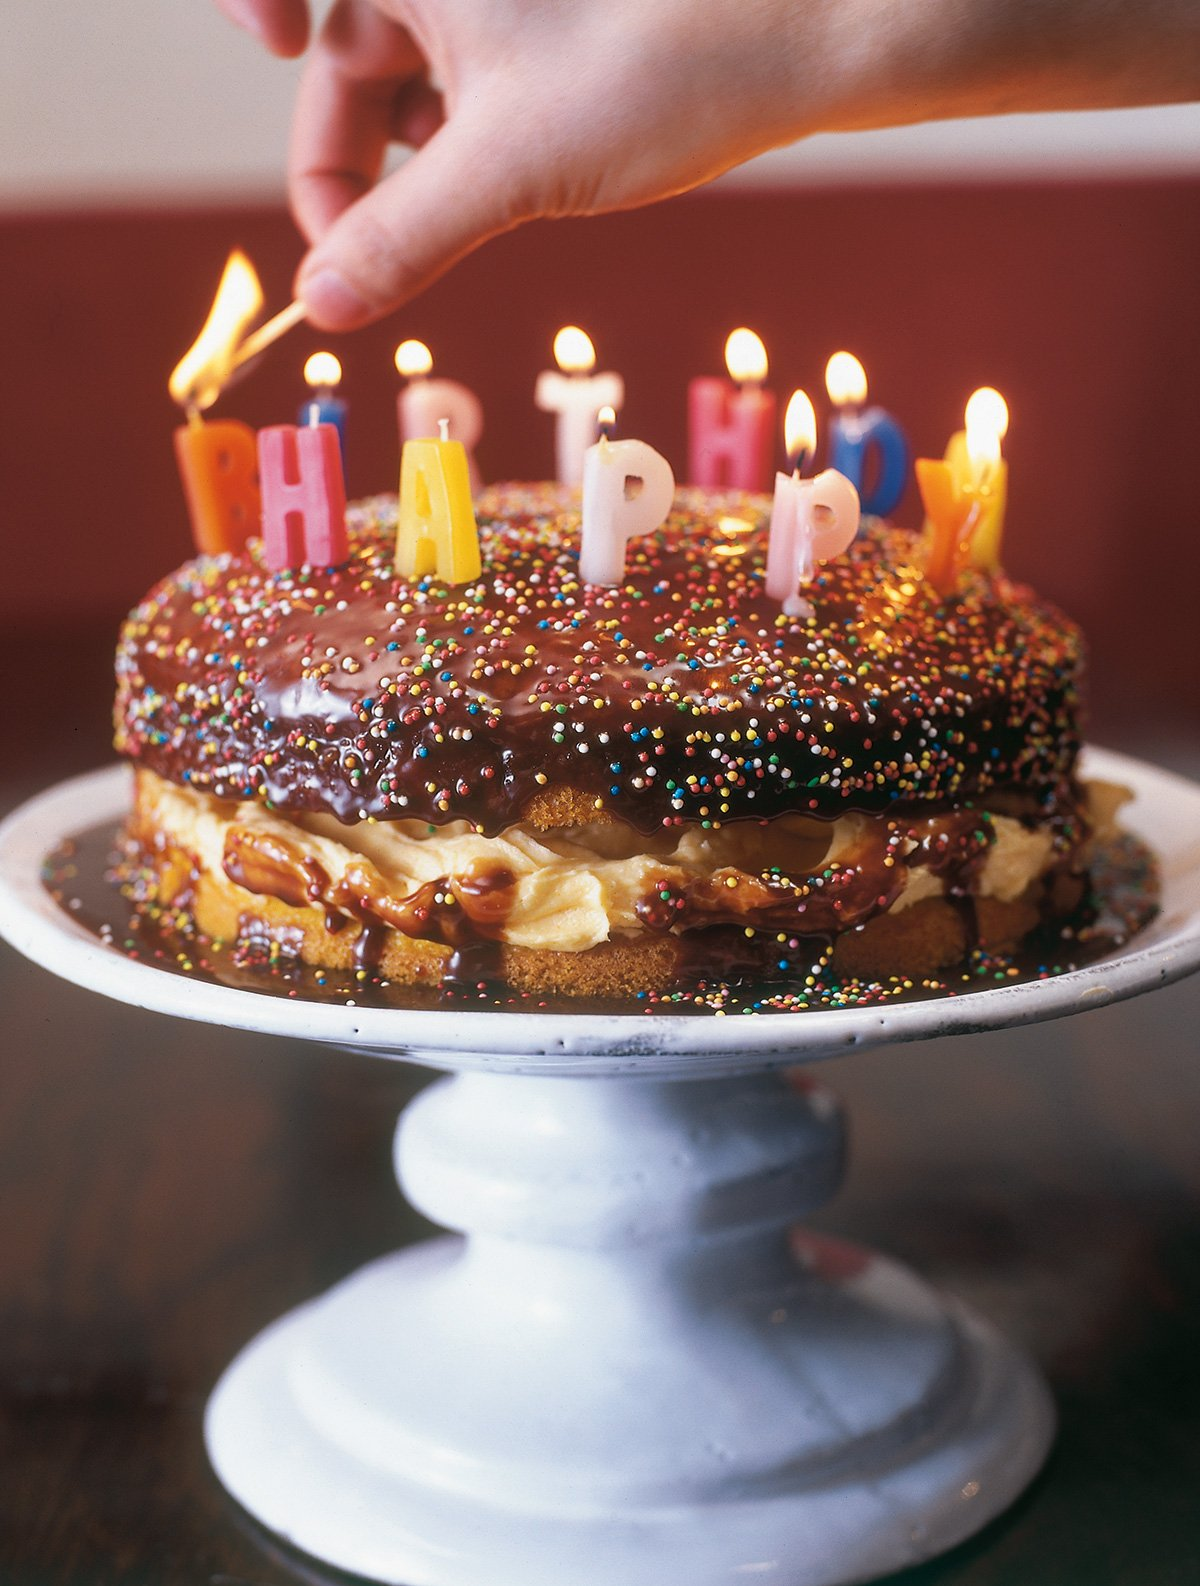 Sponge recipes for birthday cakes